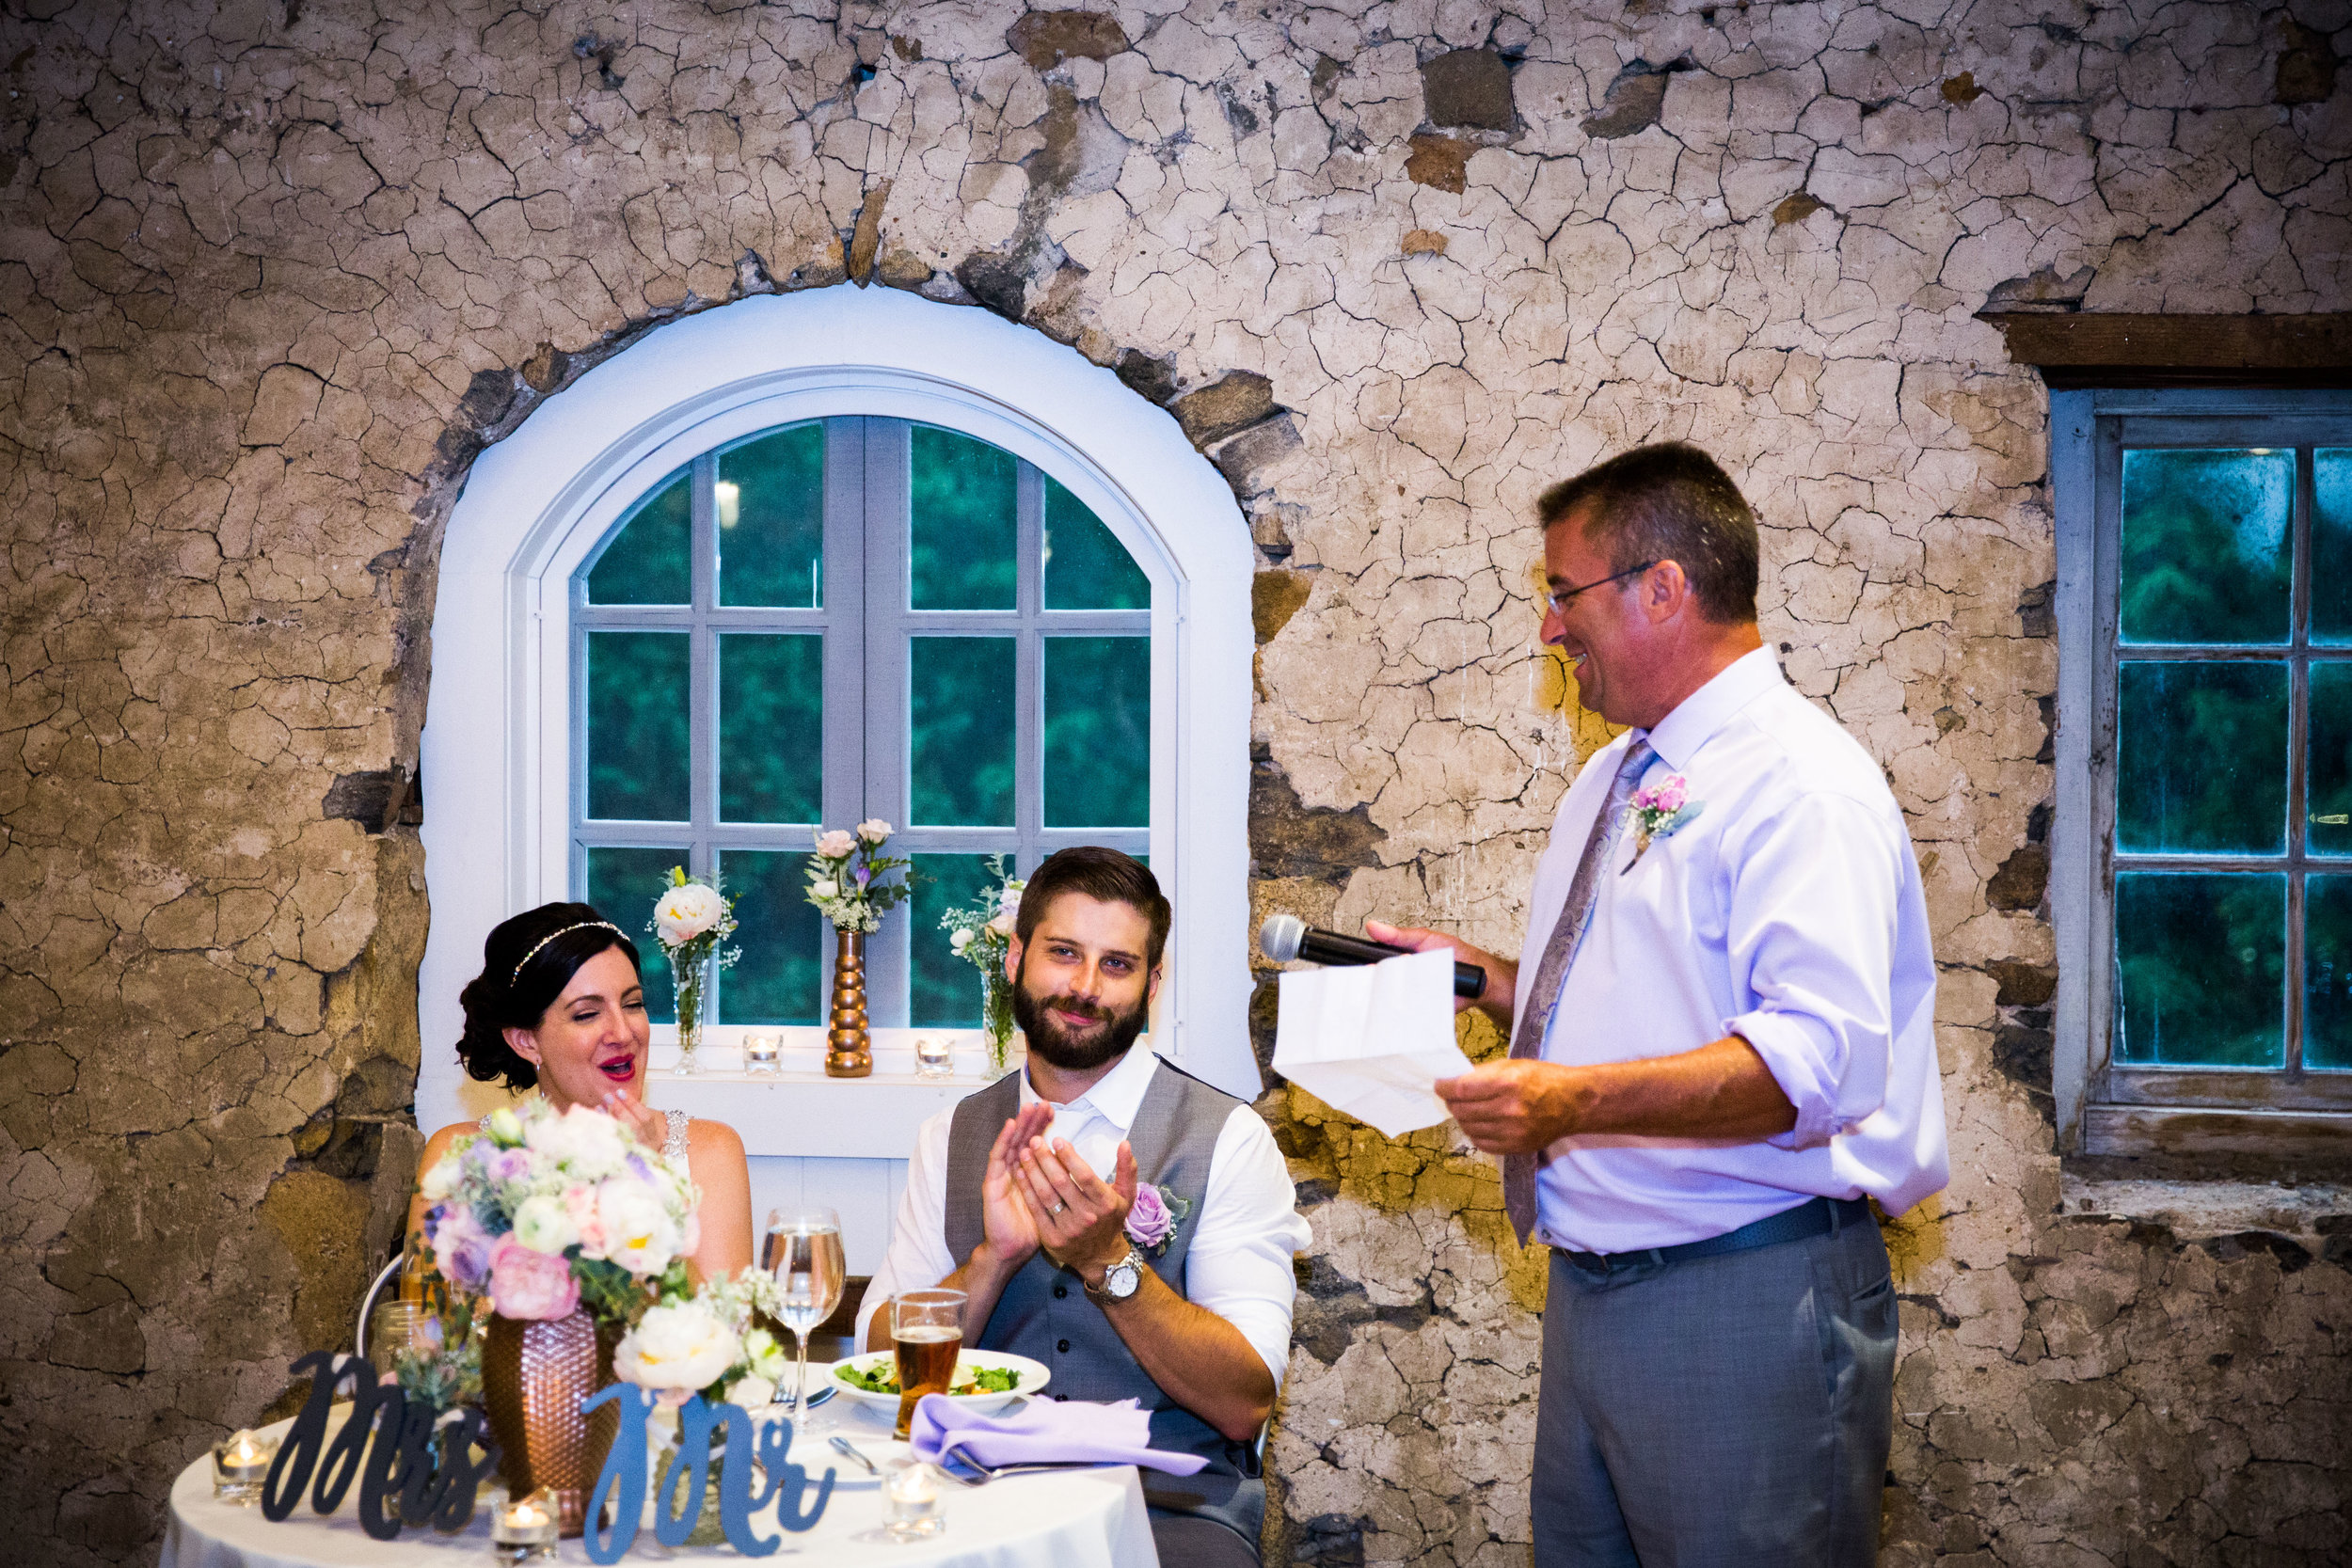 TYLER ARBORETUM WEDDING PHOTOGRAPHY LOVESTRUCK PICTURES-086.jpg